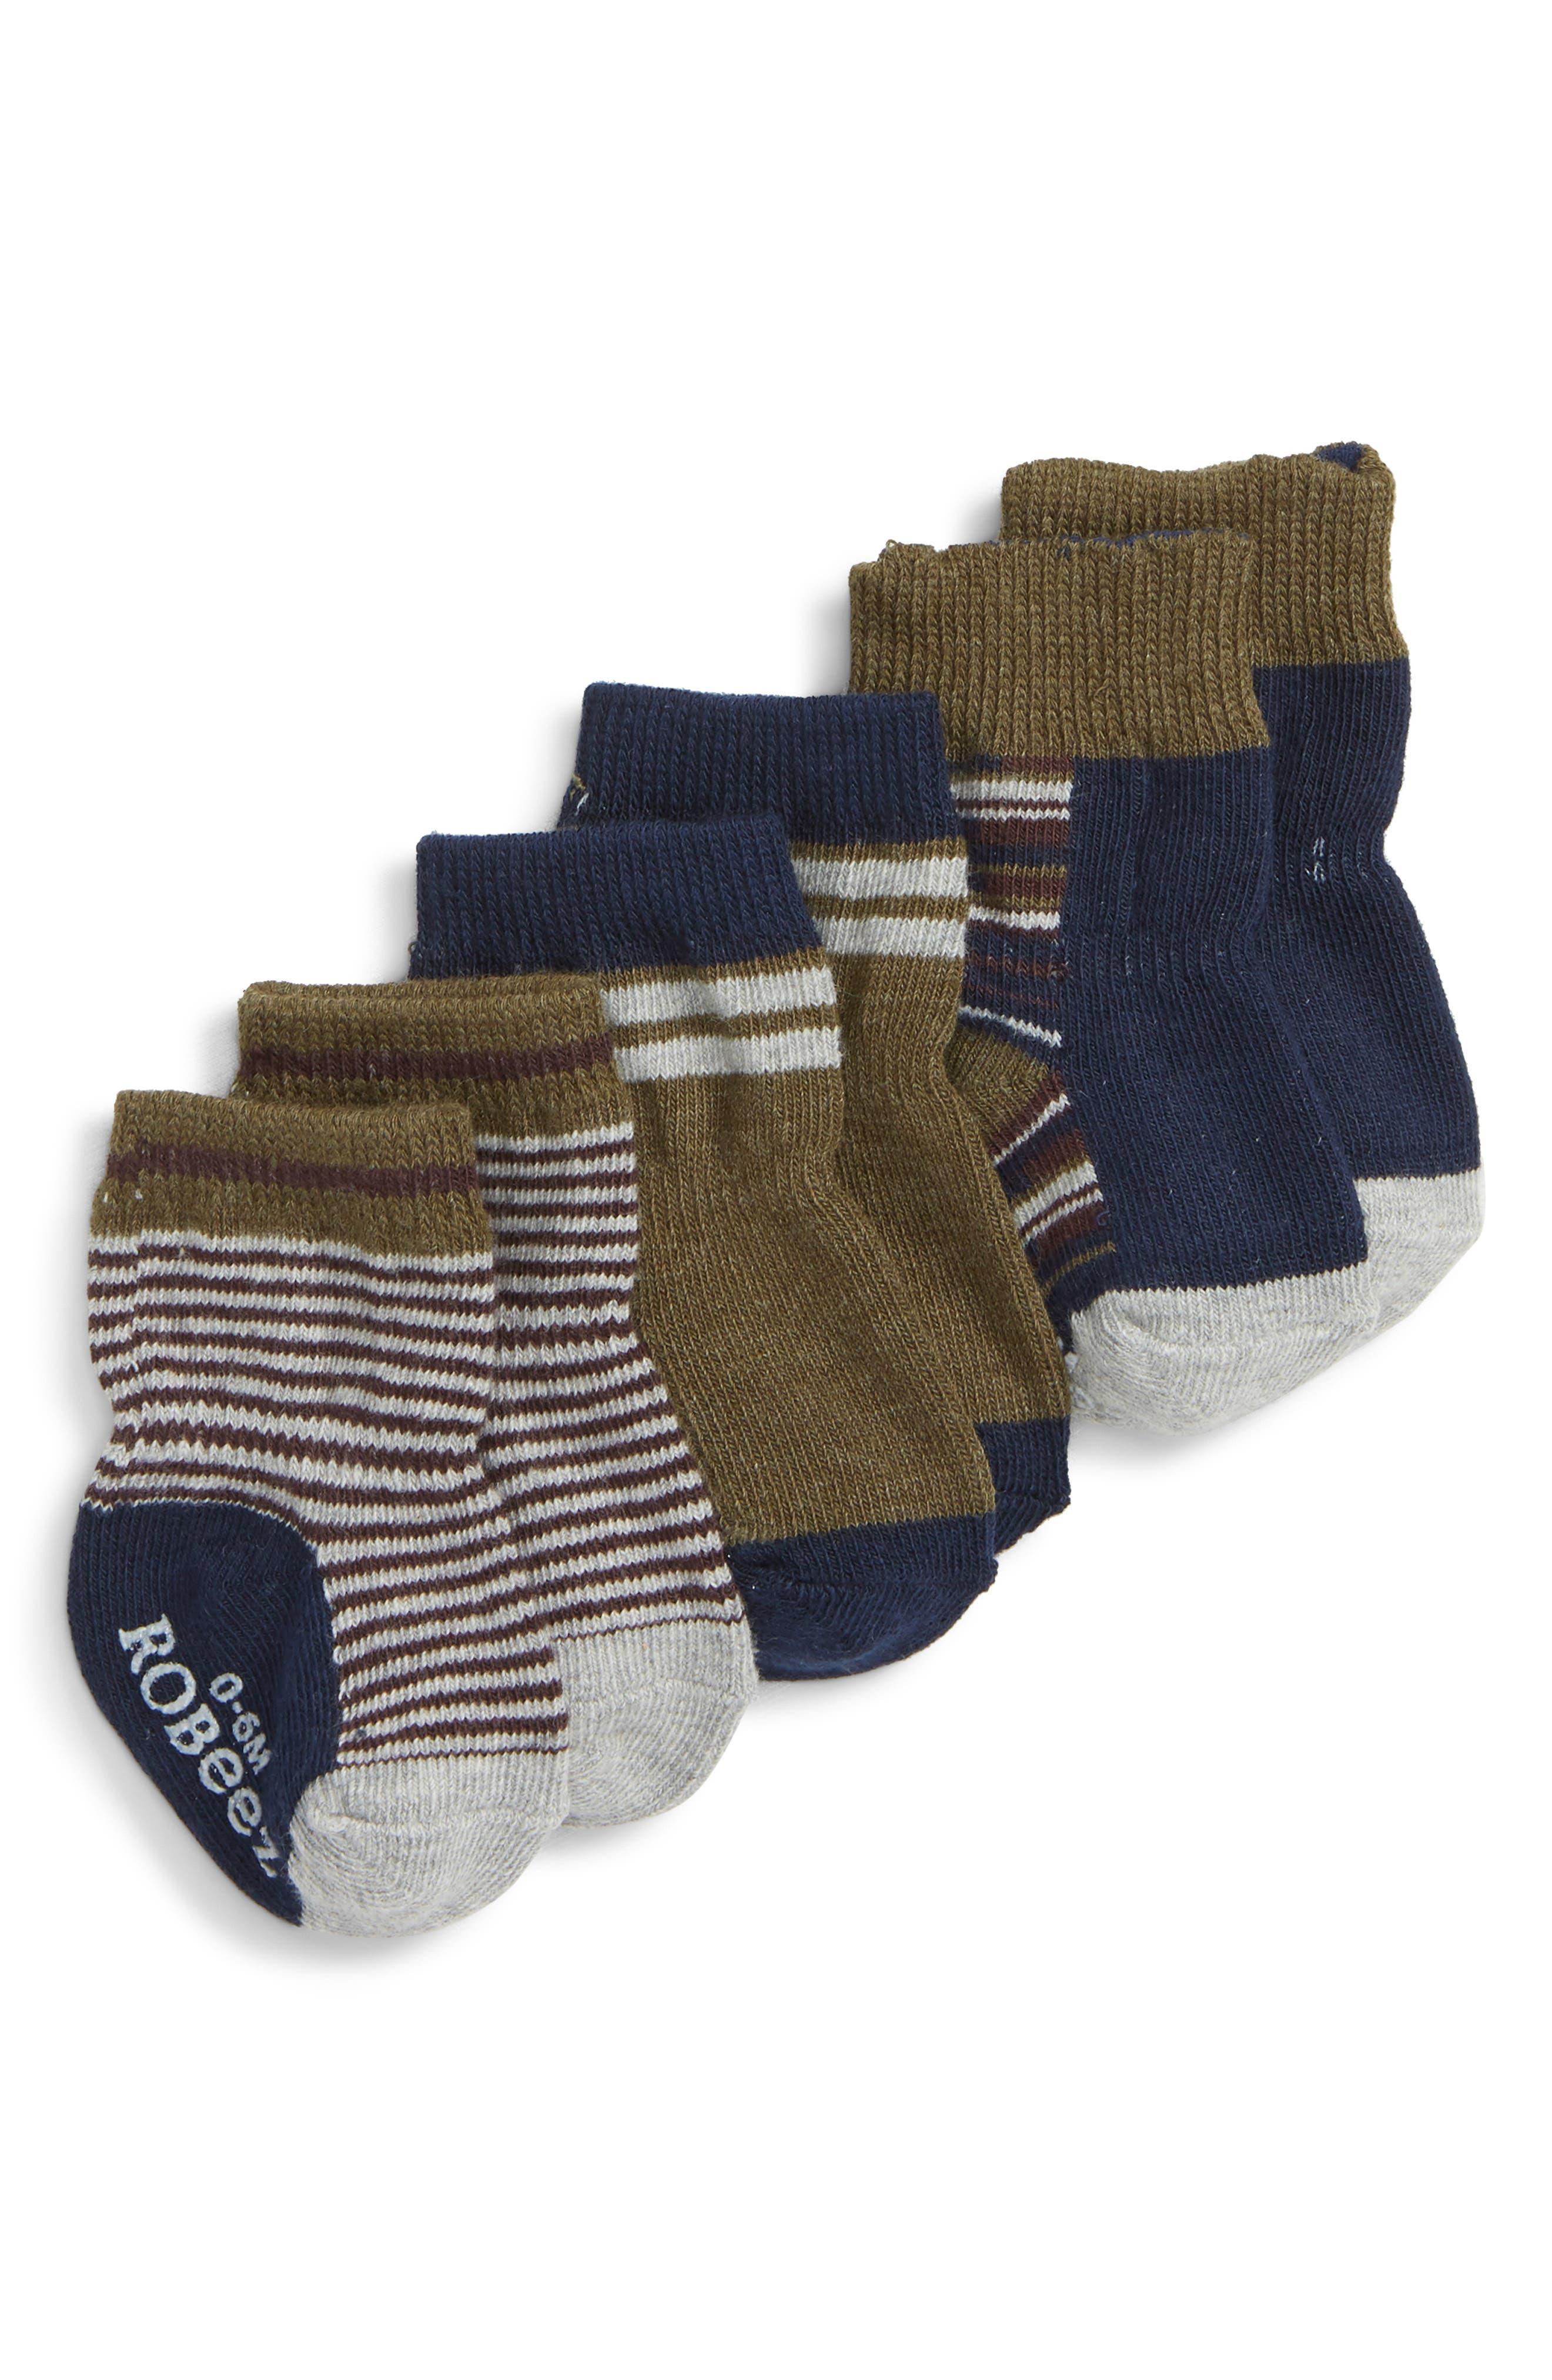 3-Pack Crew Socks,                             Main thumbnail 1, color,                             OLIVE/ NAVY/ GREY